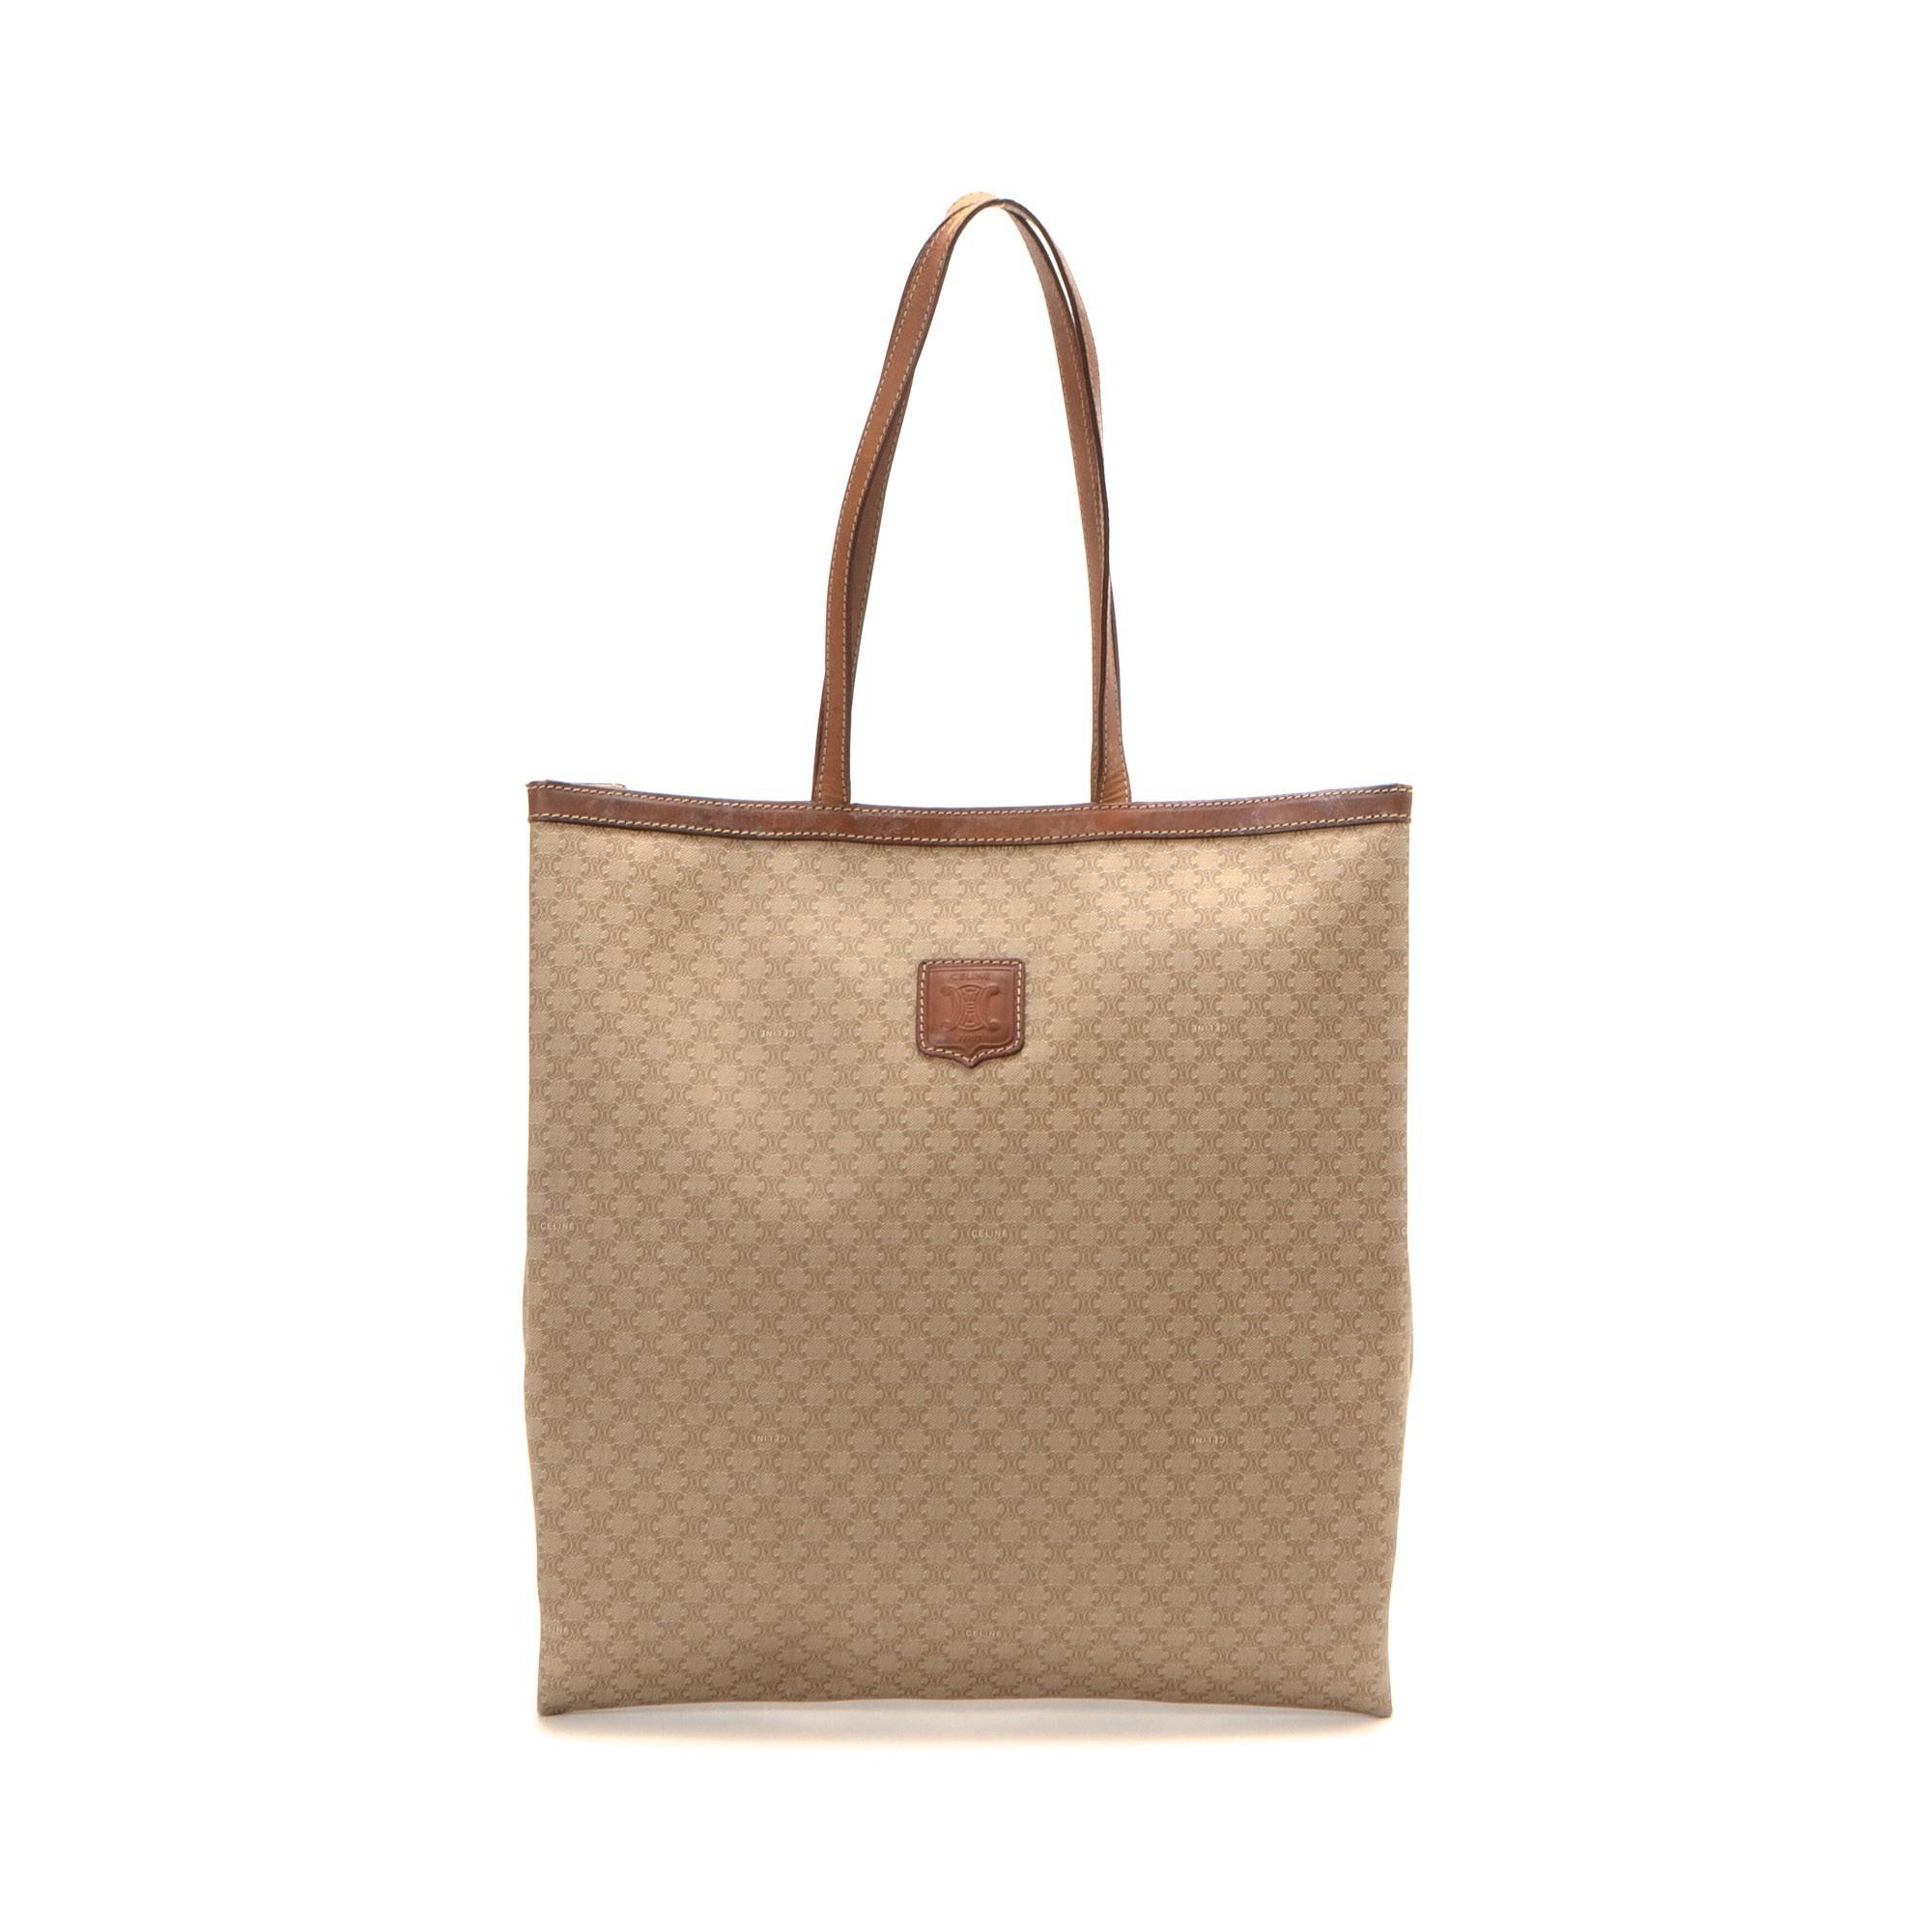 prada vernice soft - celine vanity pouch, celine leather bag